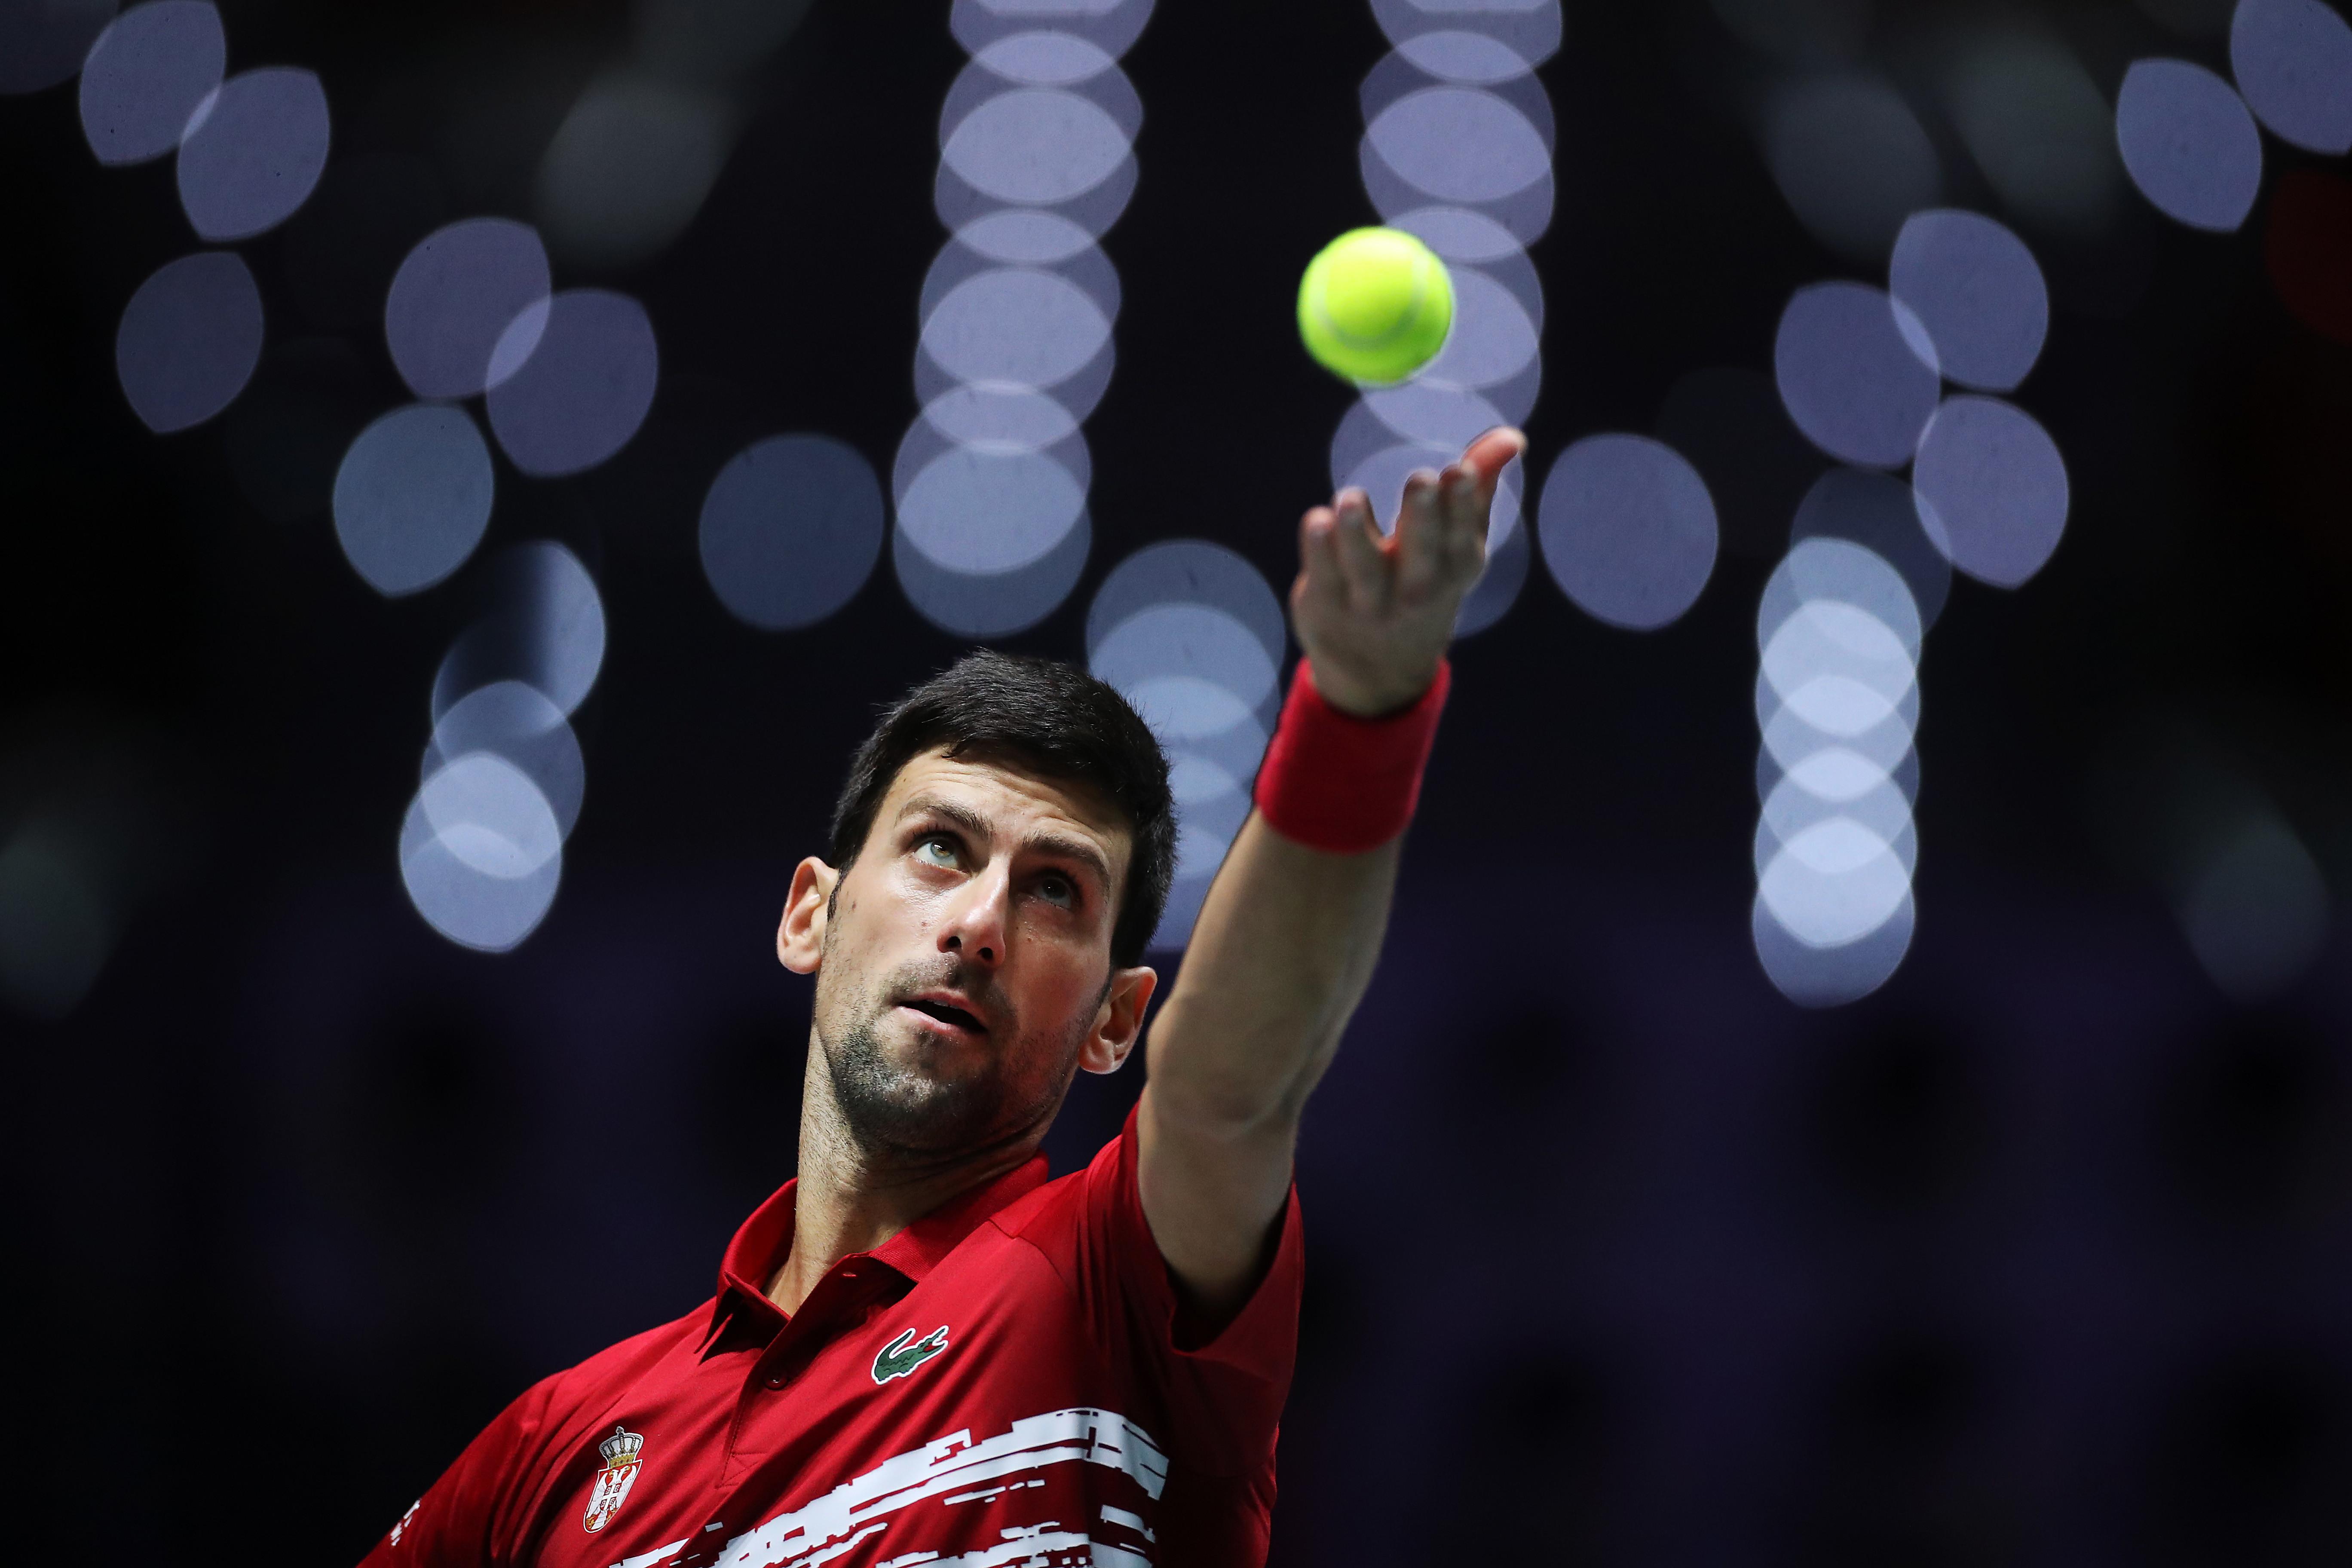 10) Novak Djokovic (tennis)